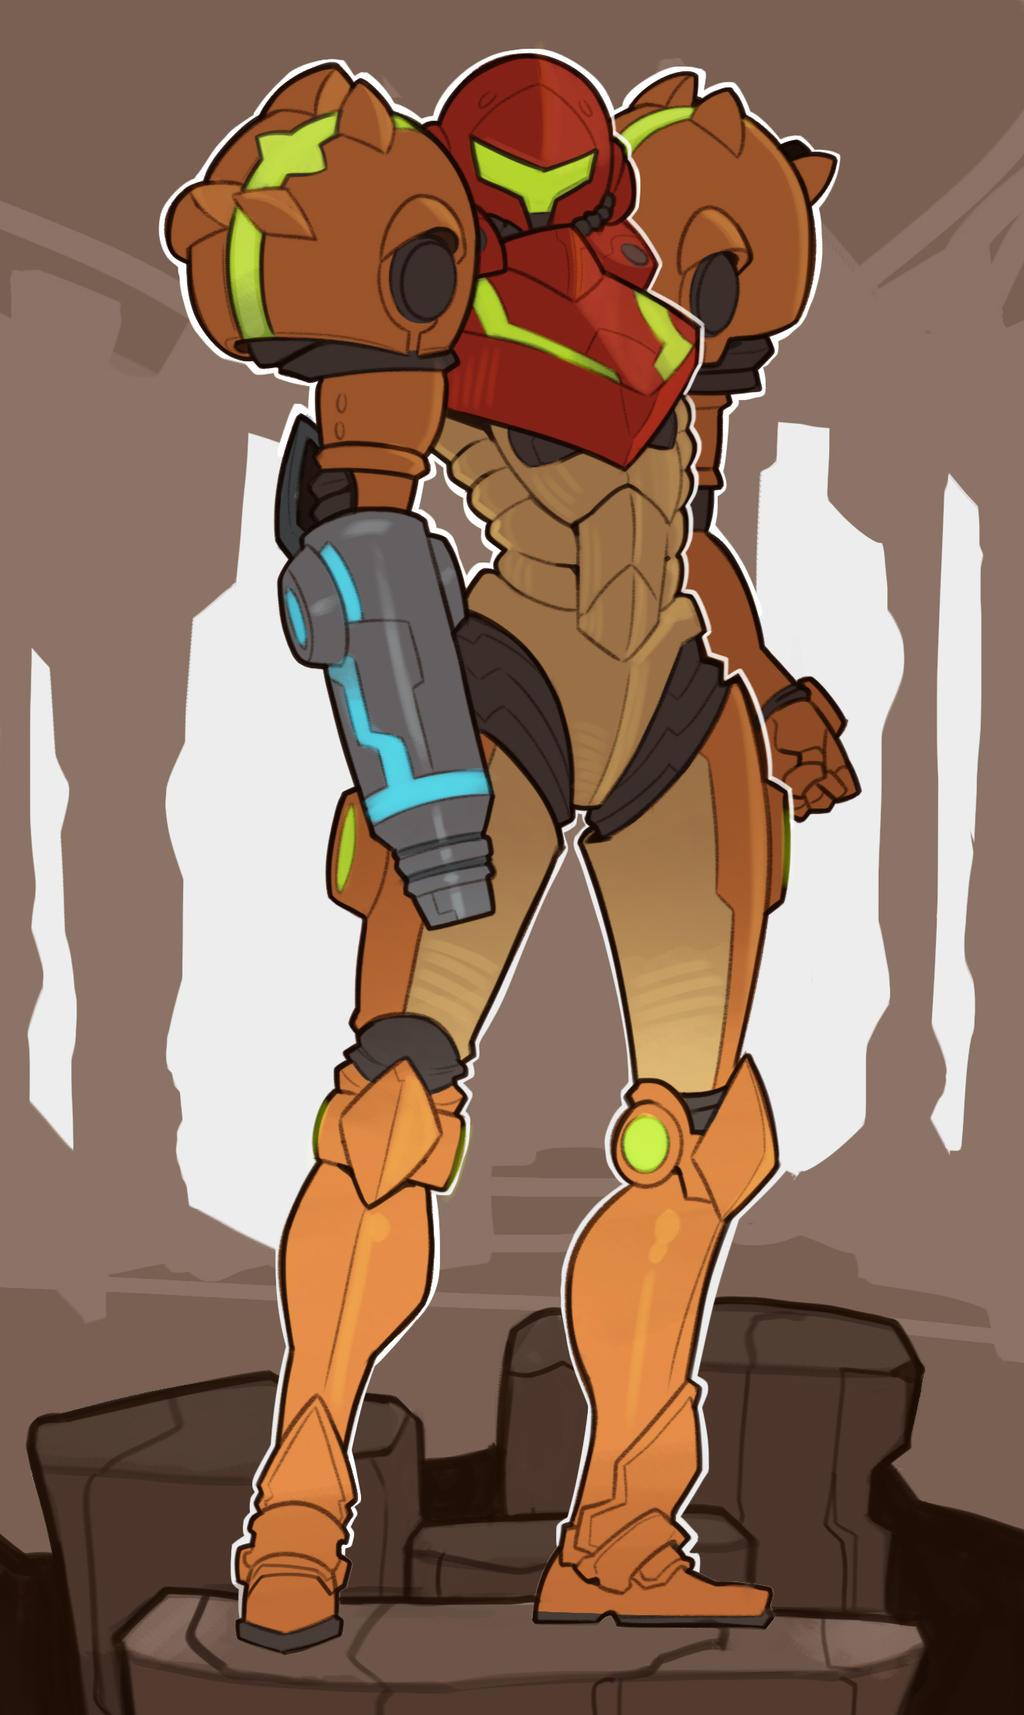 Metroid By Splashbrush On Deviantart